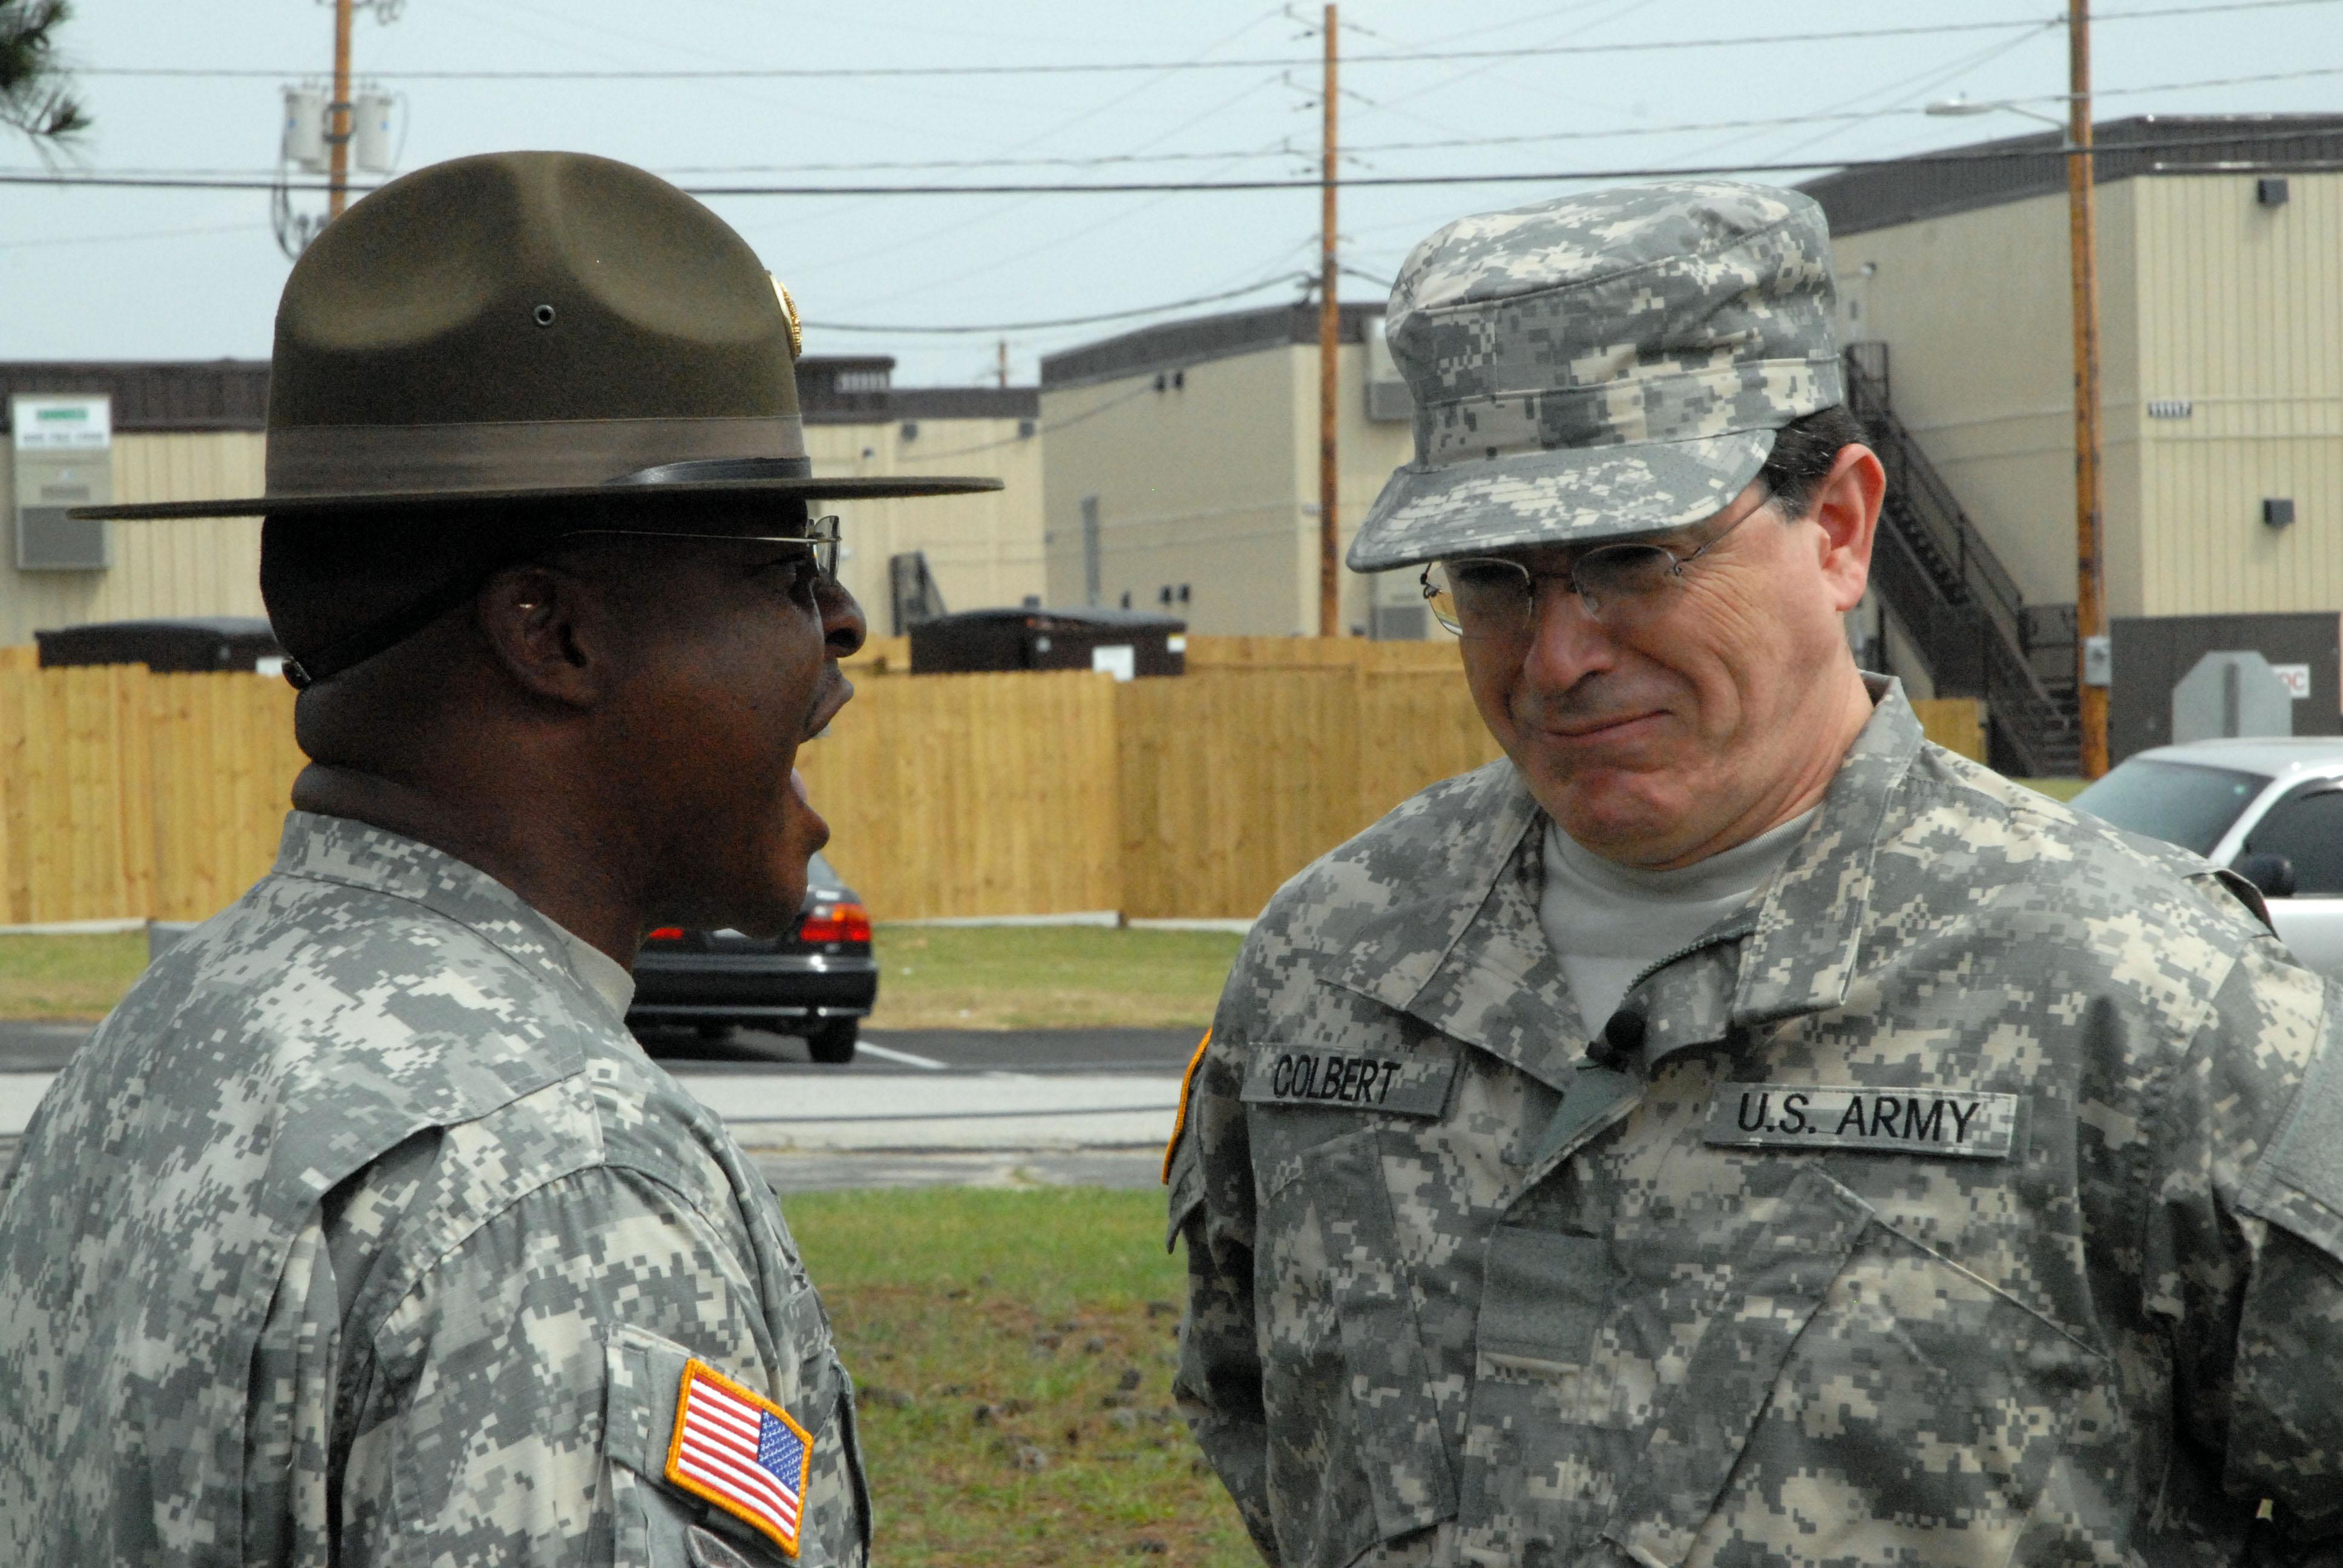 File:Flickr - The U.S. Army - Drill sergeant discipline.jpg ...